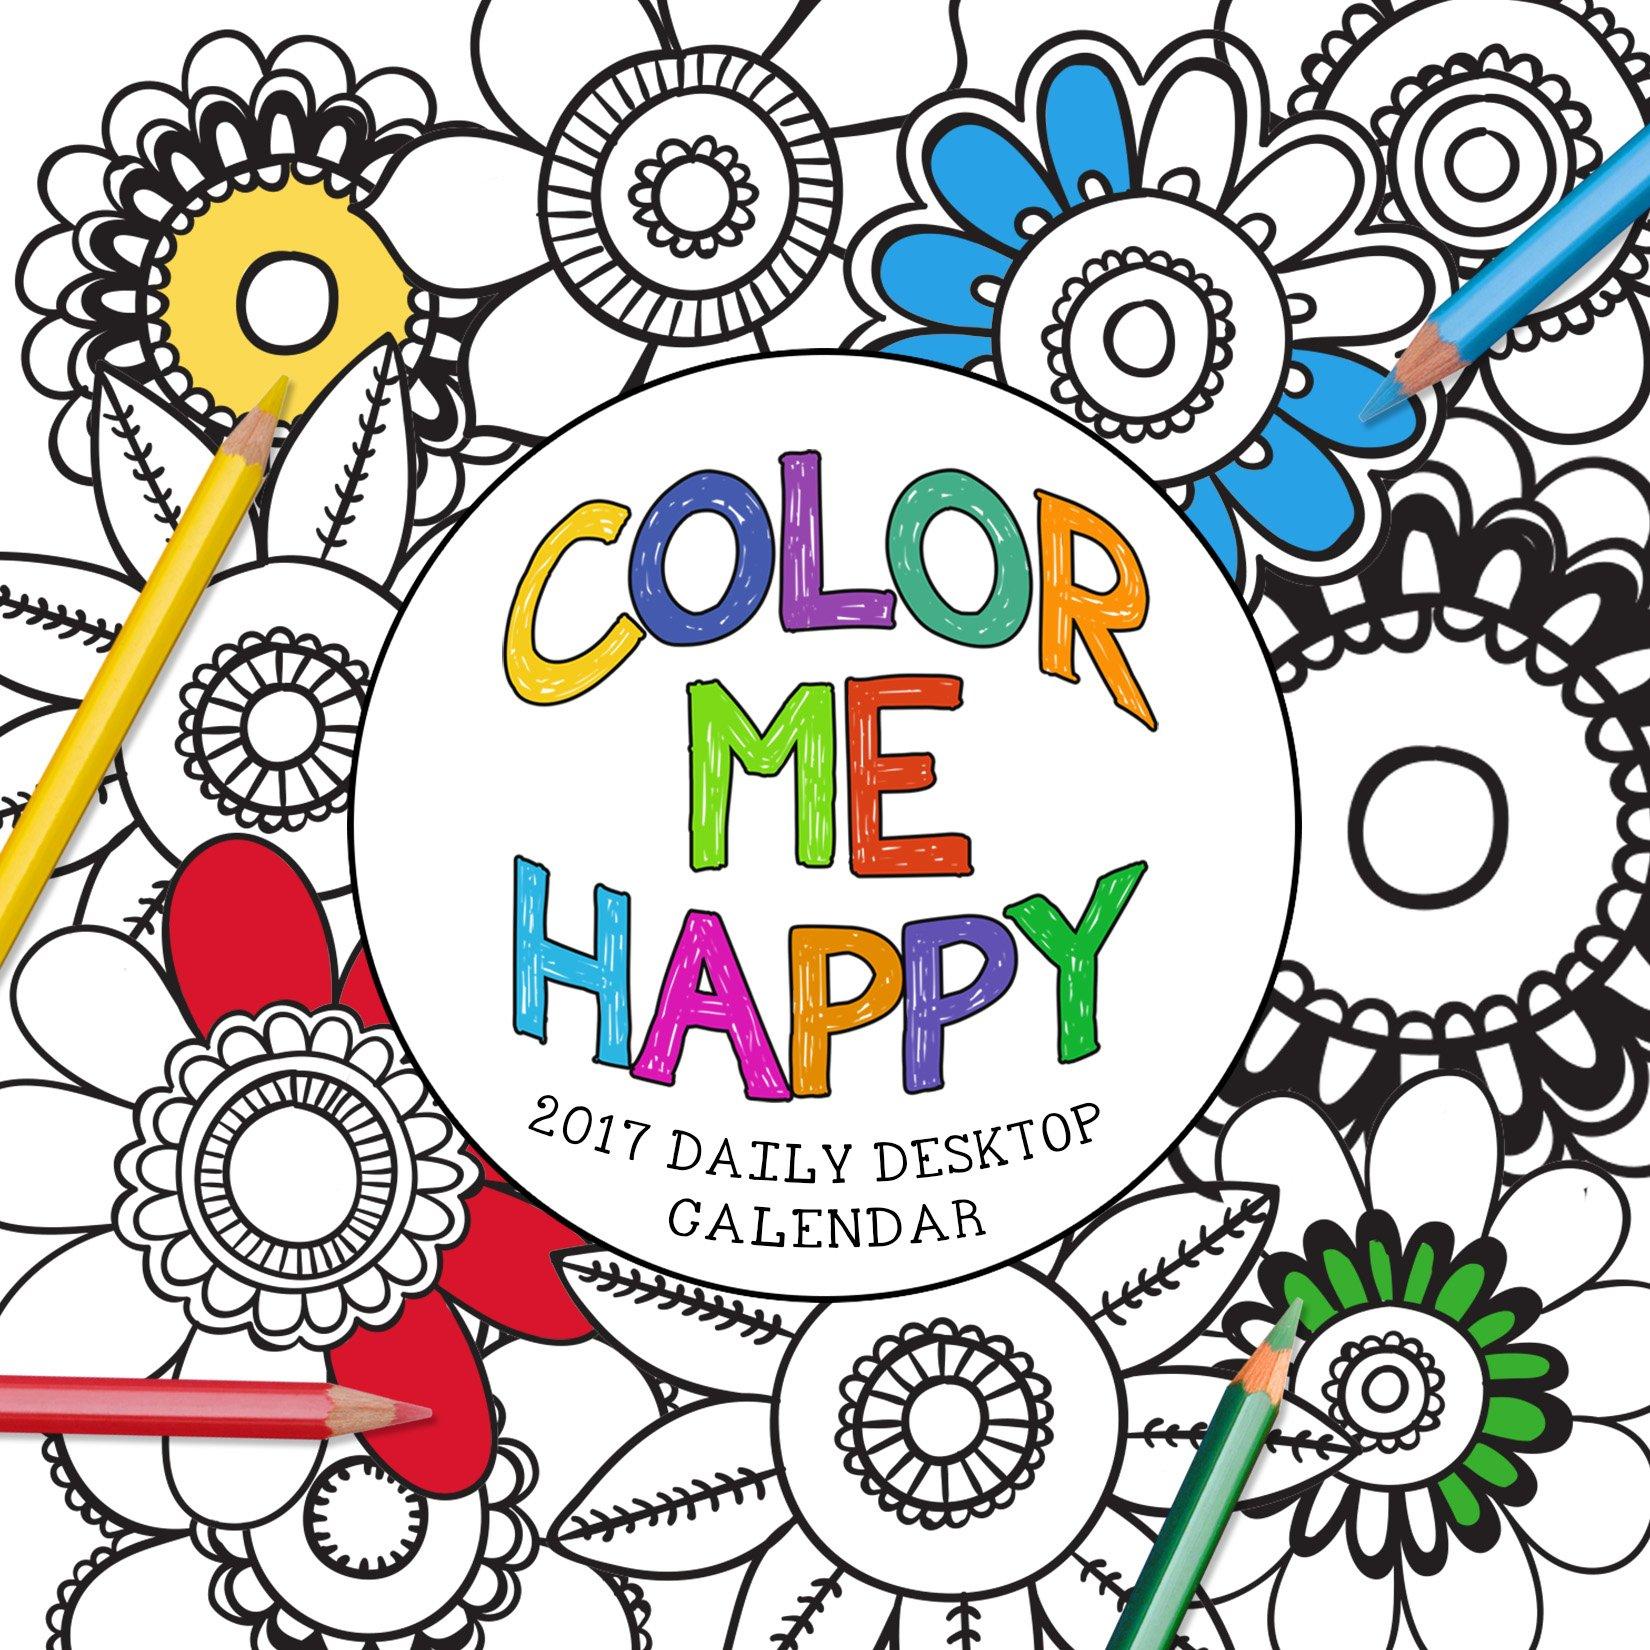 2017 Color Me Happy Daily Desktop Calendar Calendar – Day to Day Calendar, Desk Calendar TF Publishing Time Factory 162438790X 17-3018